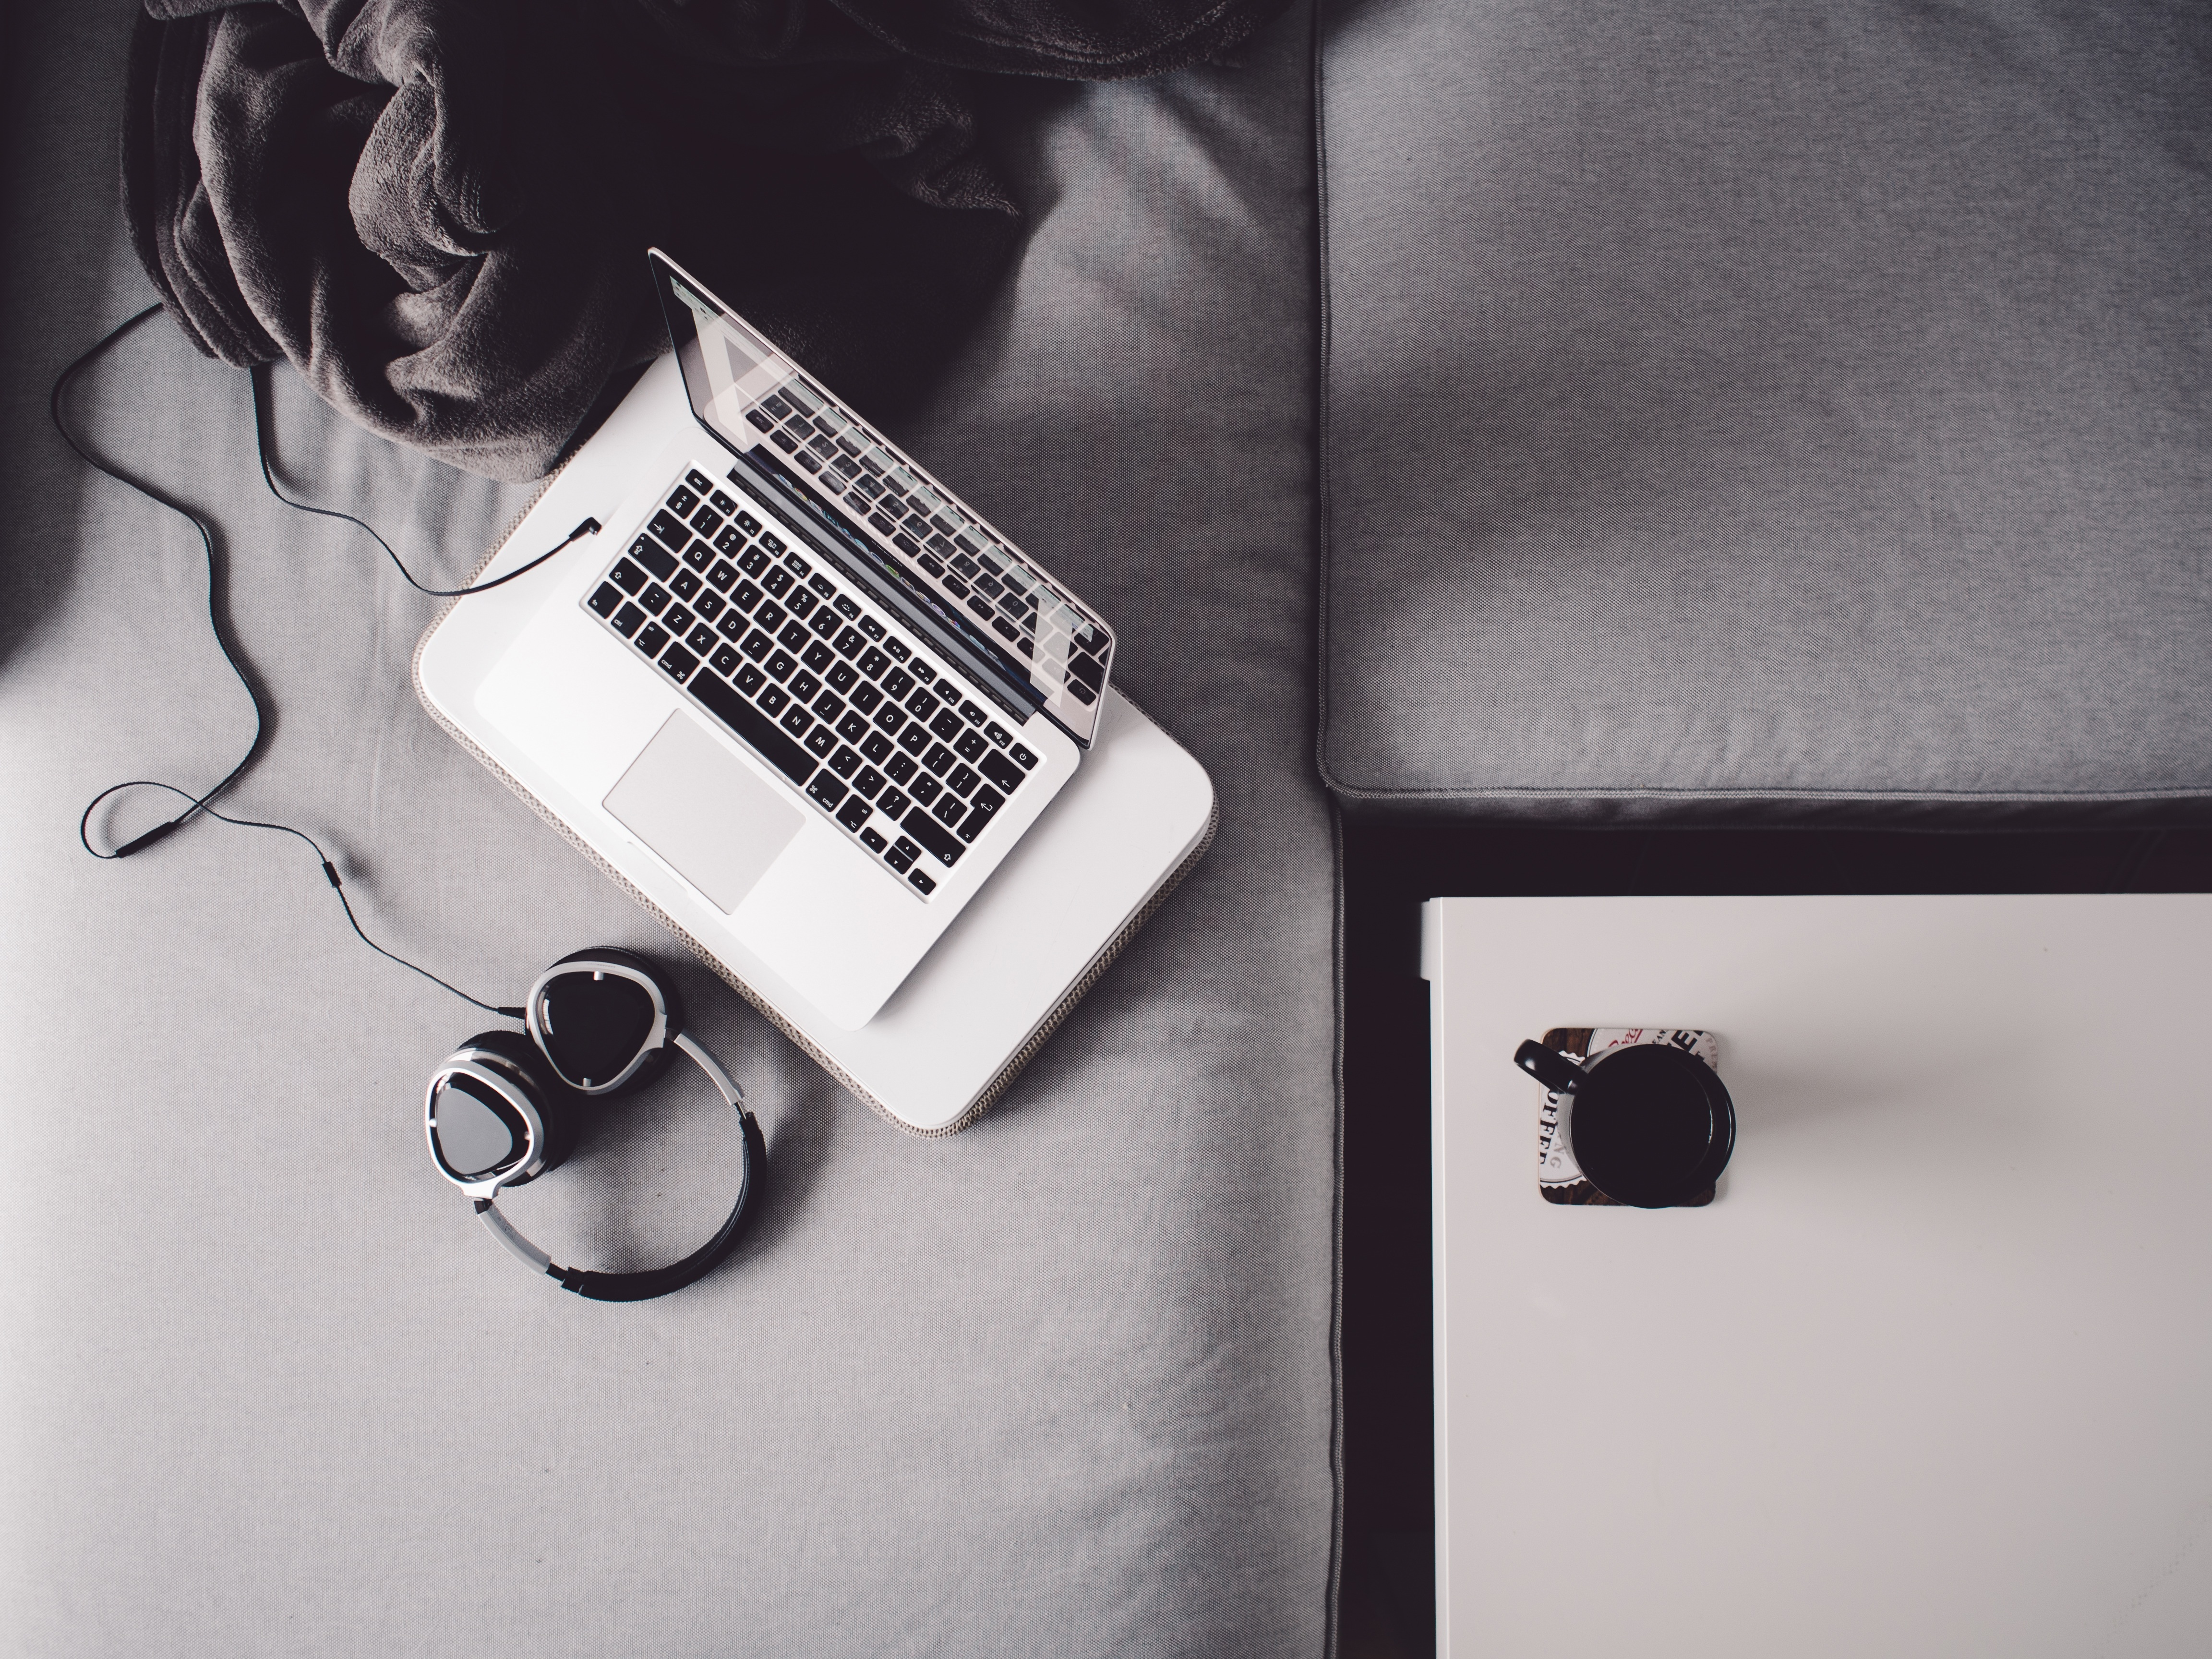 Blogerzy kradną